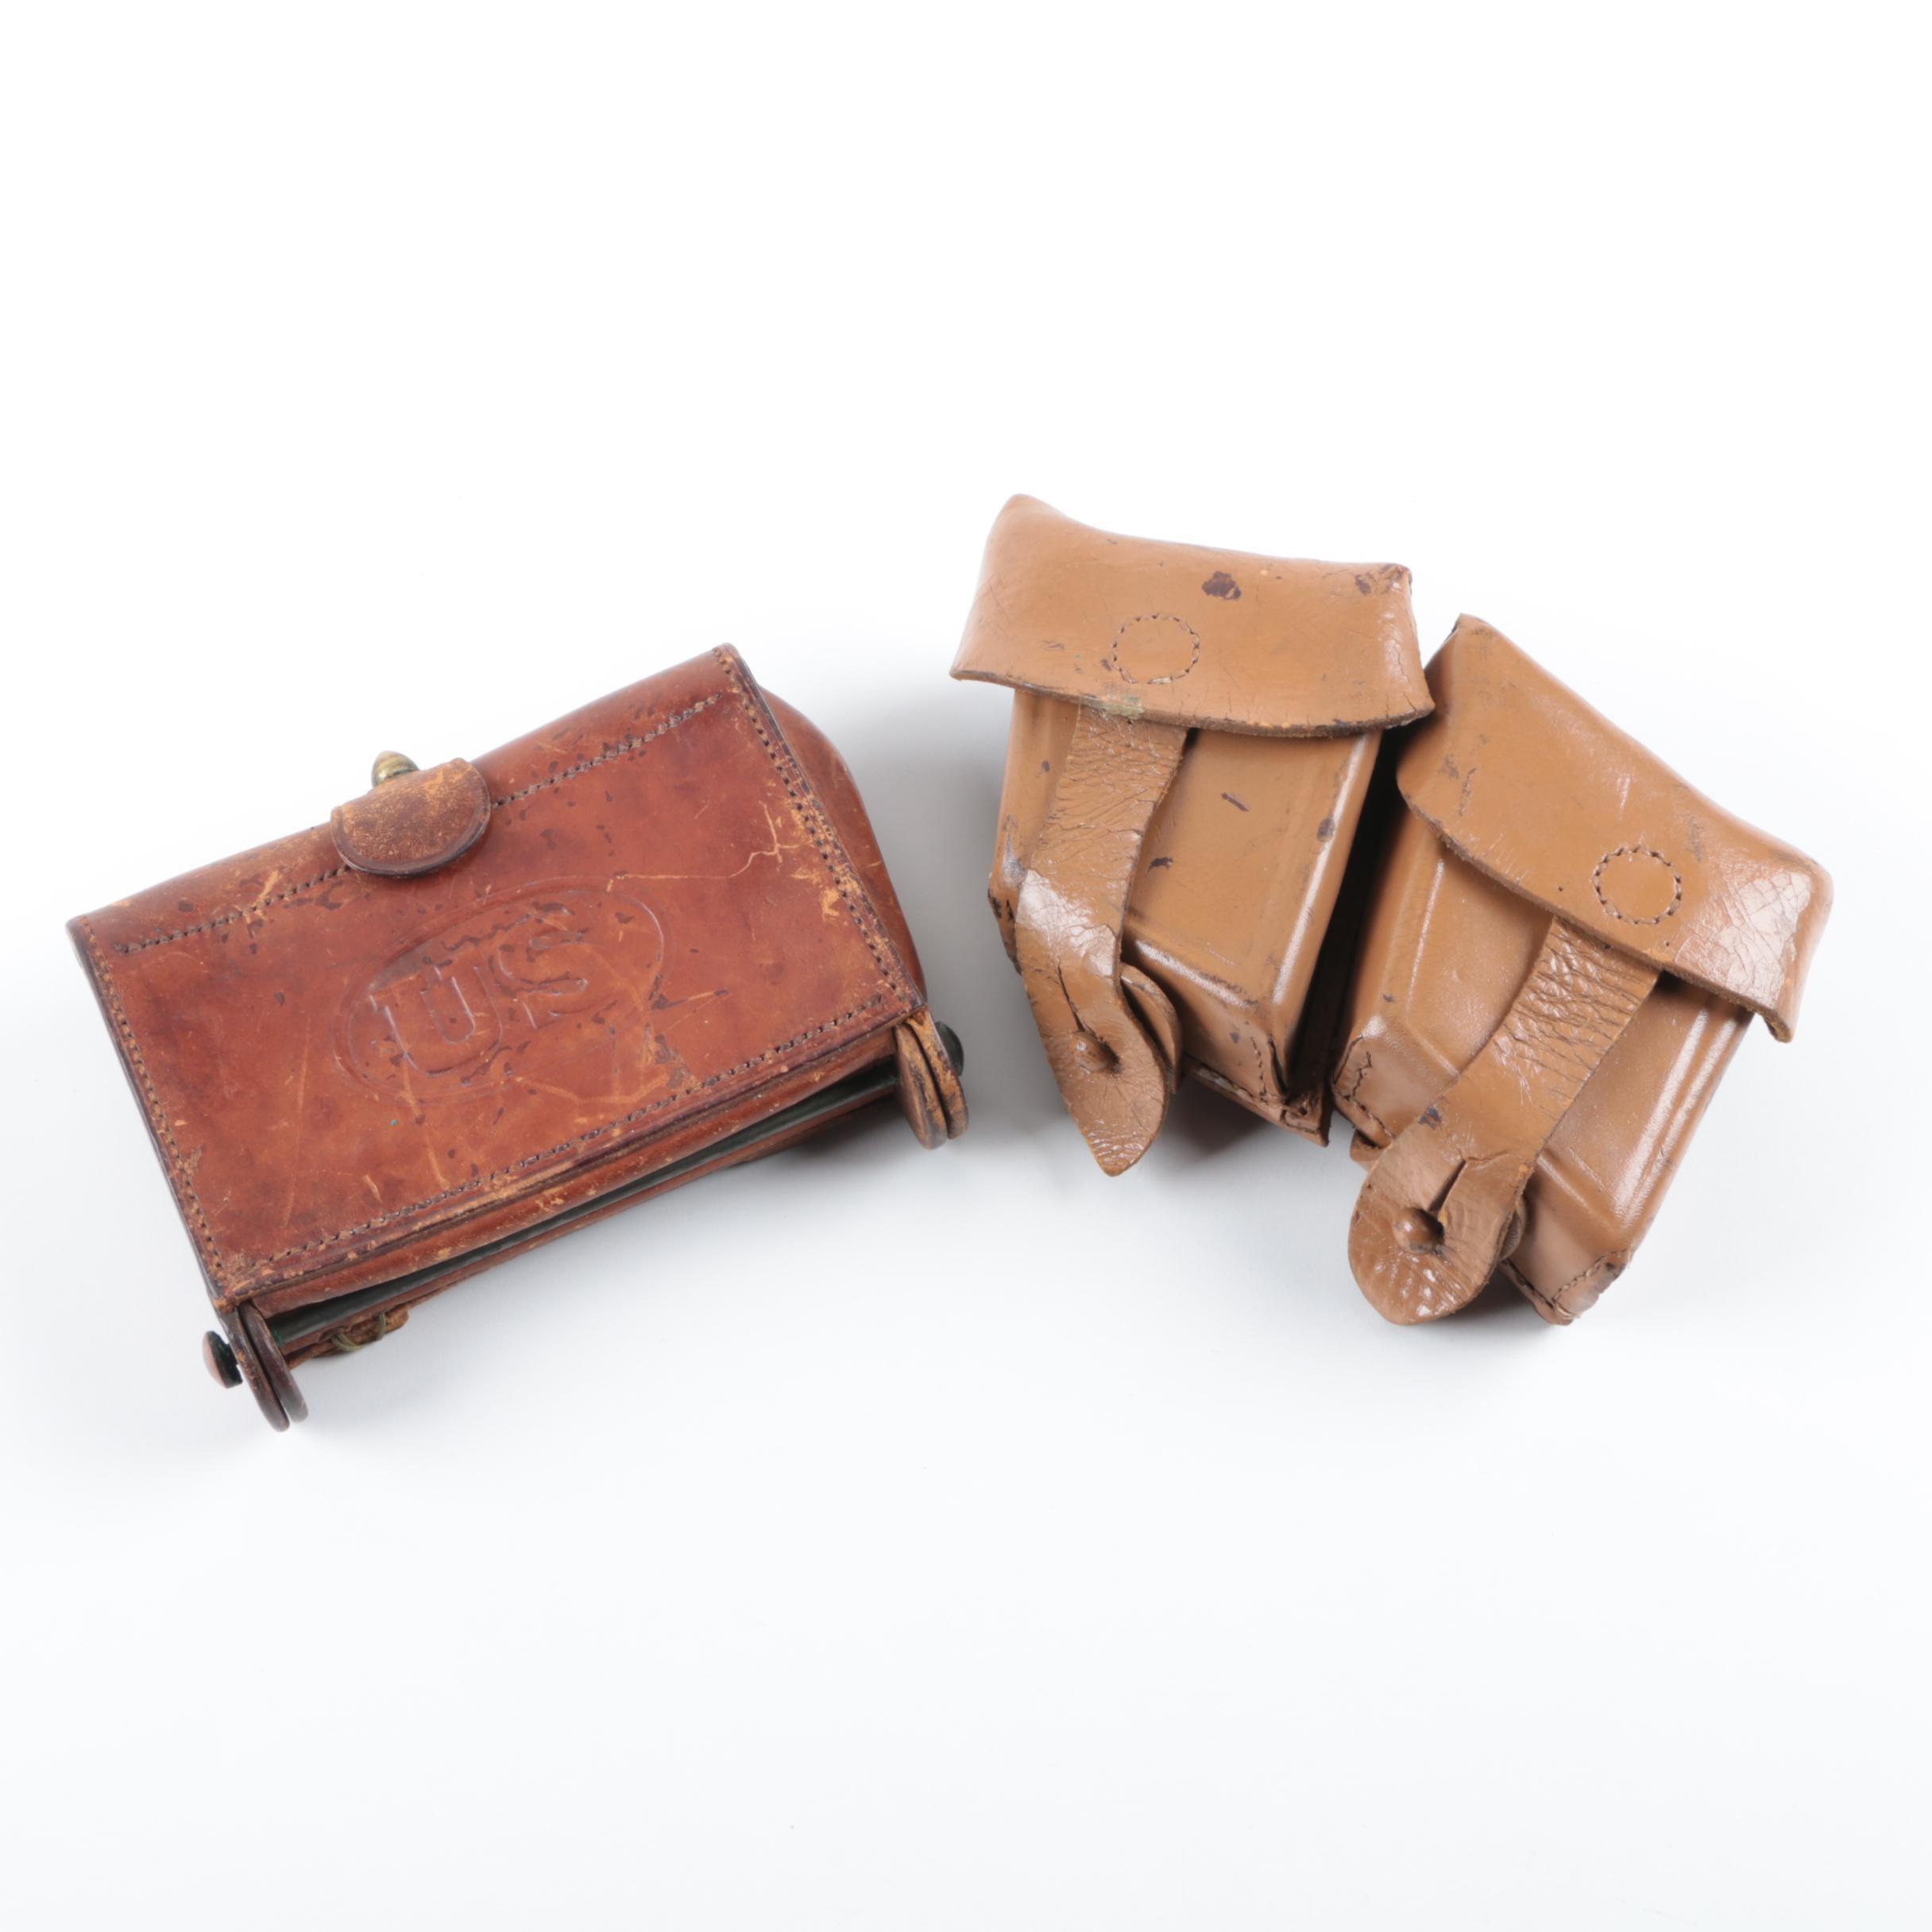 Vintage Leather Ammo Belt Pouches